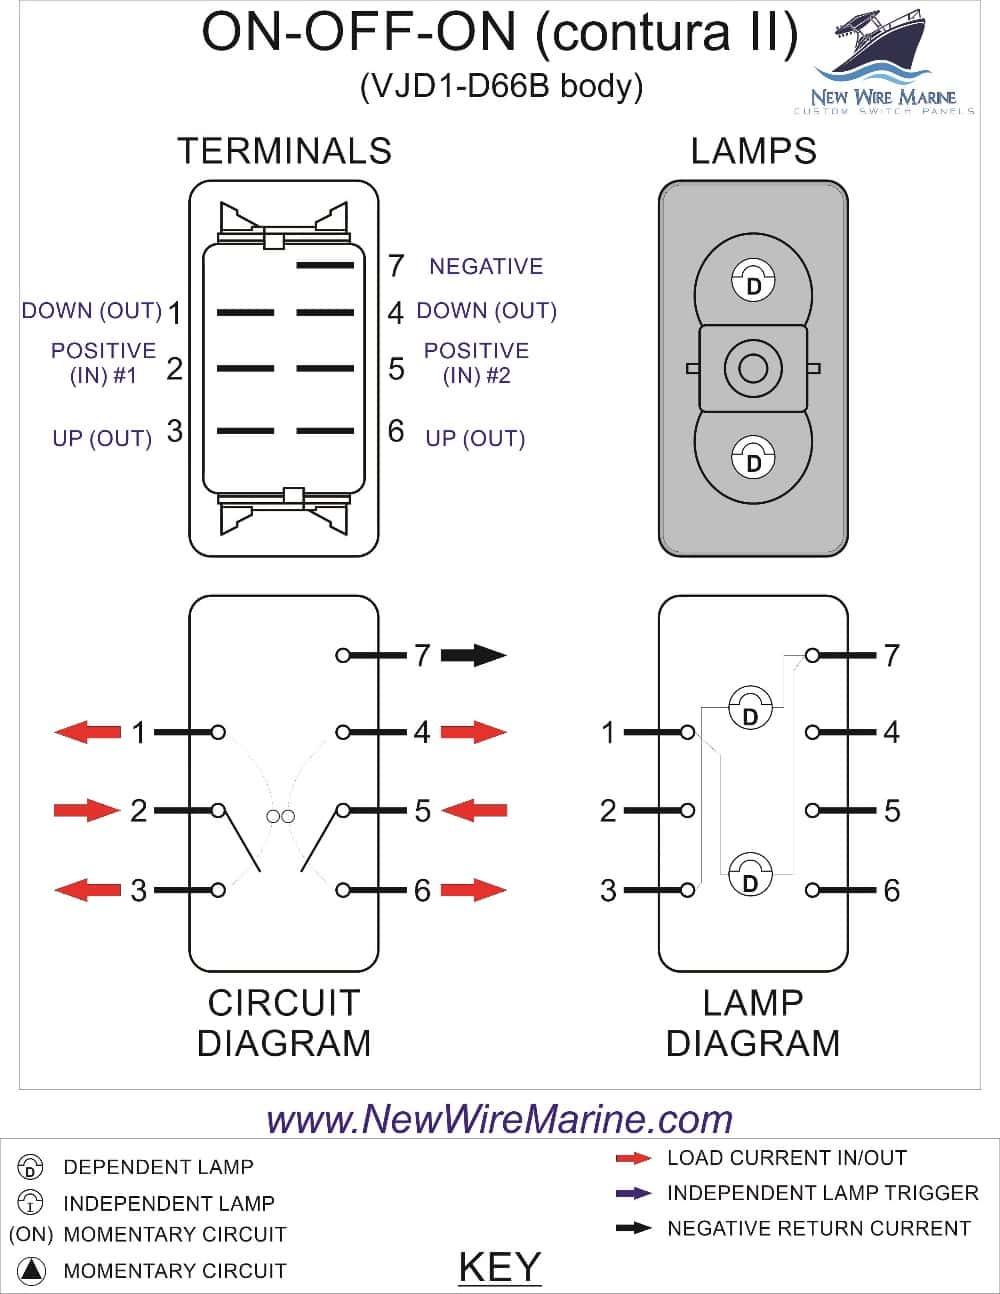 On-Off-On | Marine Rocker Switch | Carling Vjd1 | New Wire Marine - Illuminated Rocker Switch Wiring Diagram